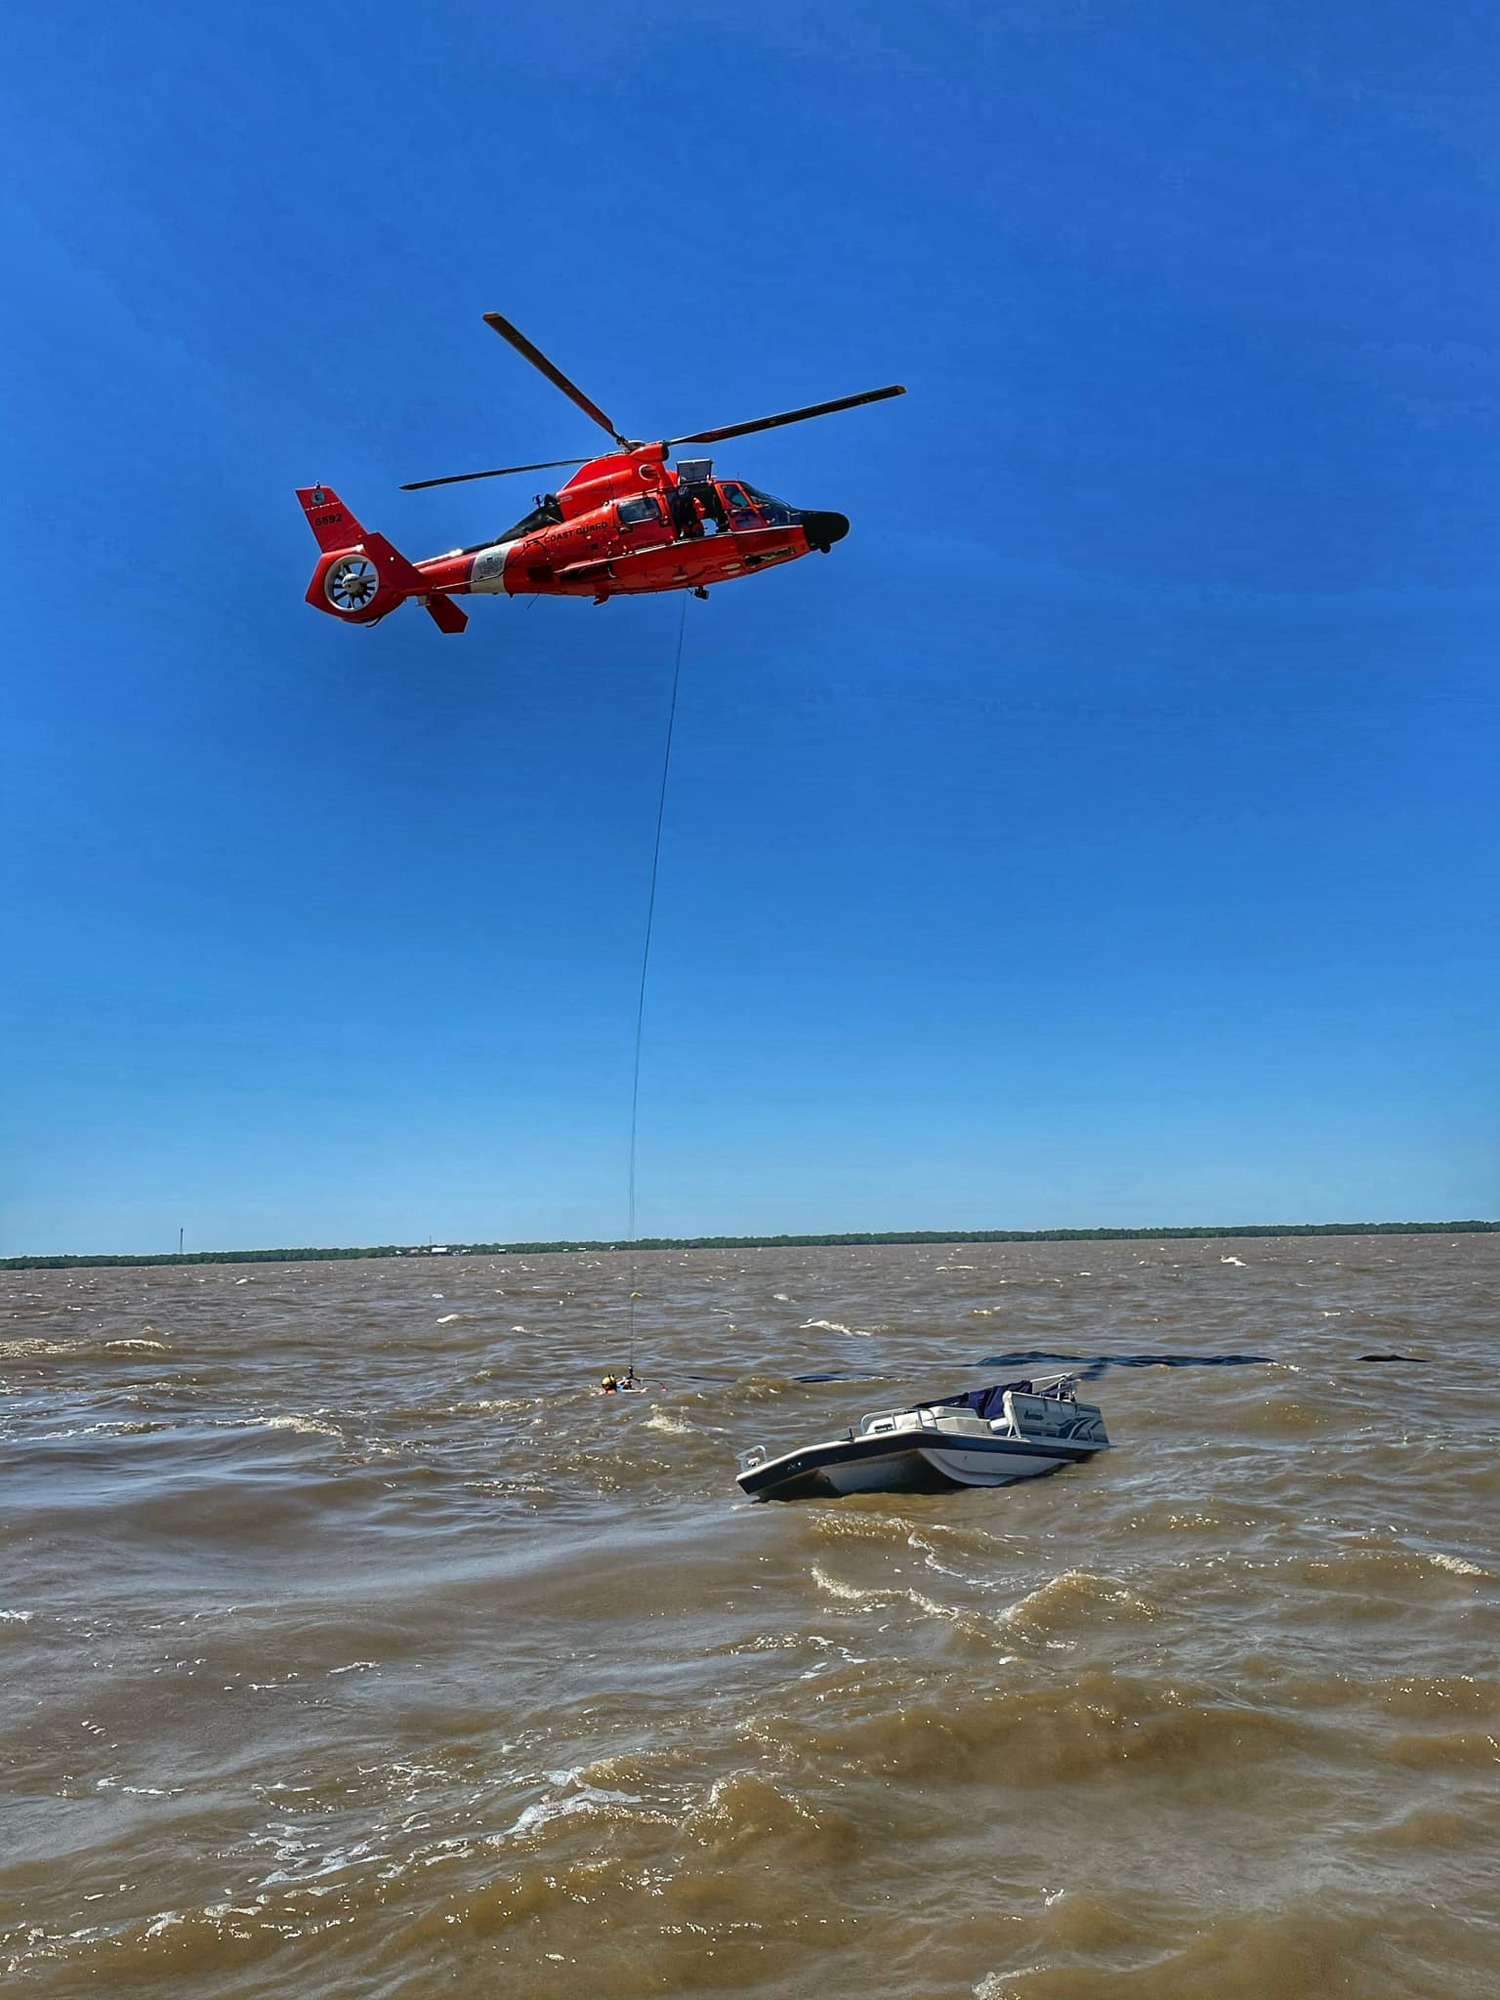 Coast Guard rescues 2 from vessel taking on water near Lake Pontchartrain